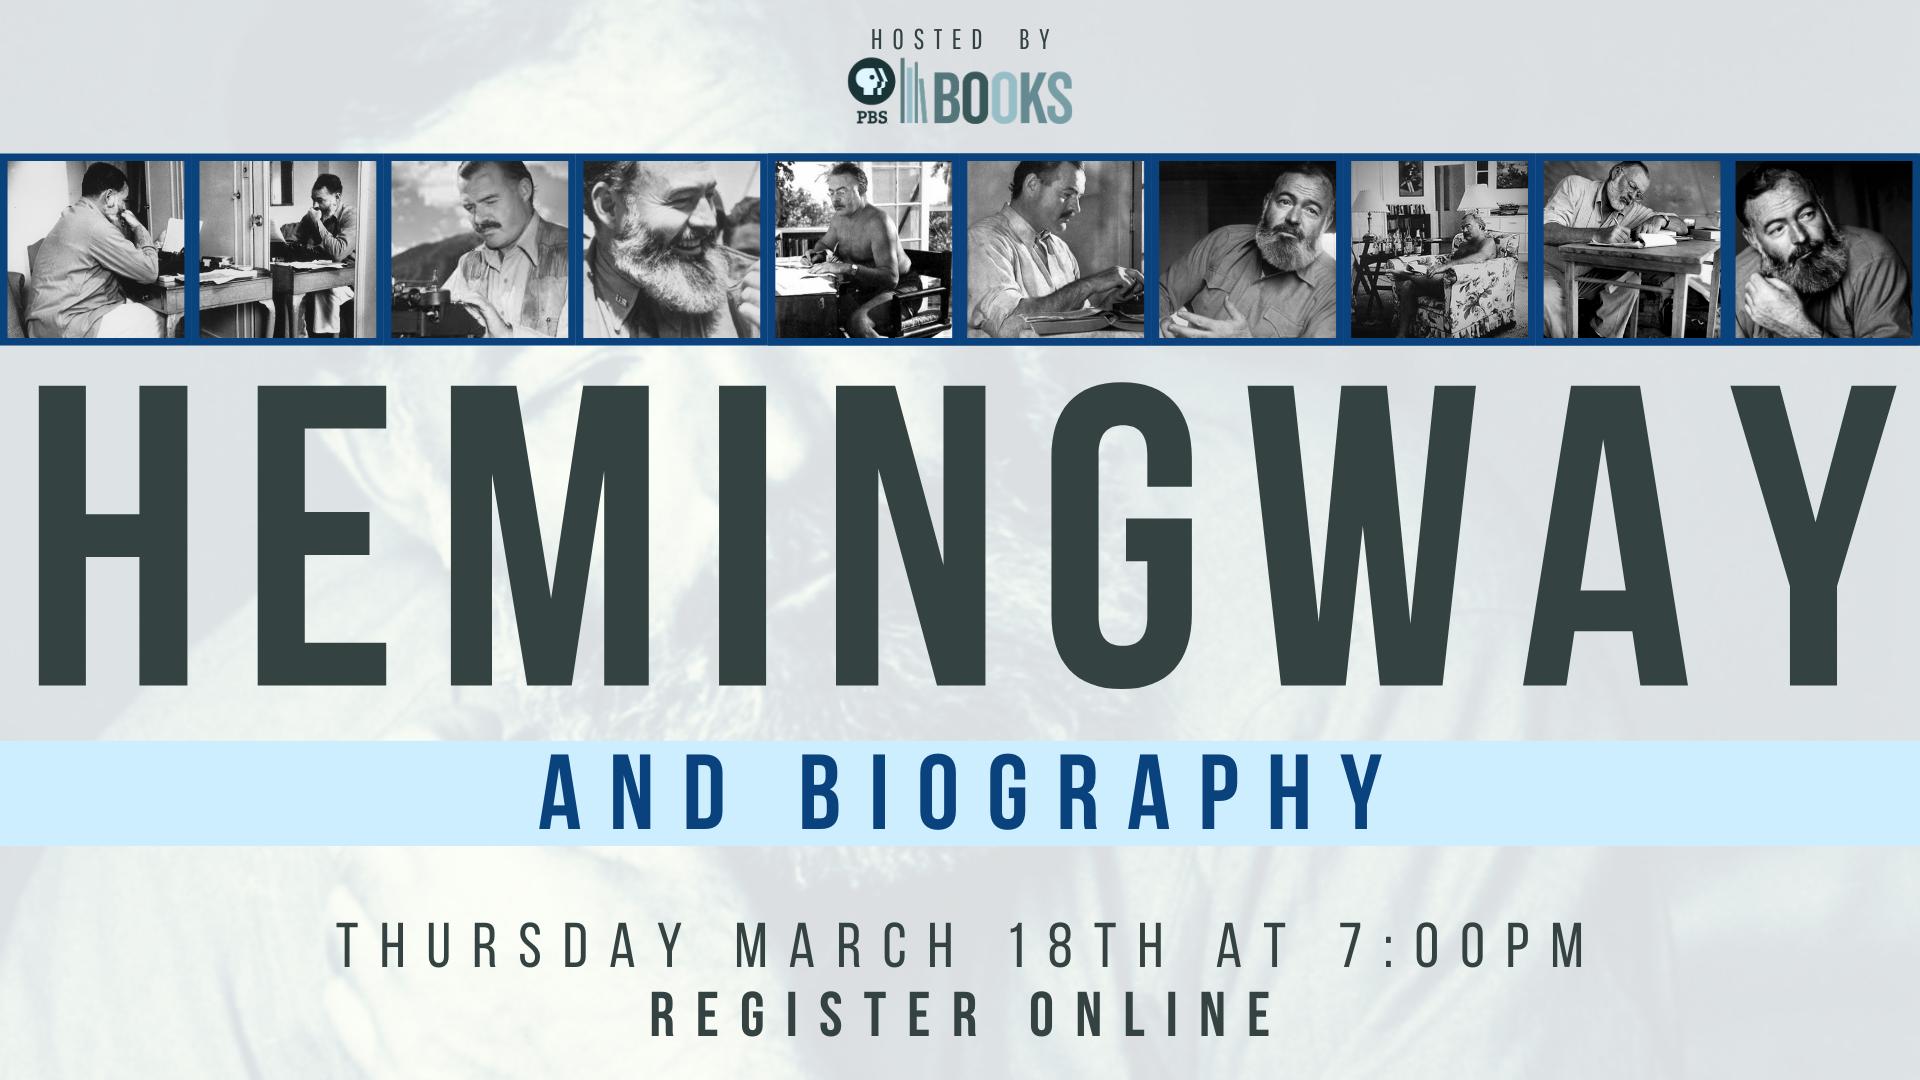 Hemingway and Biography